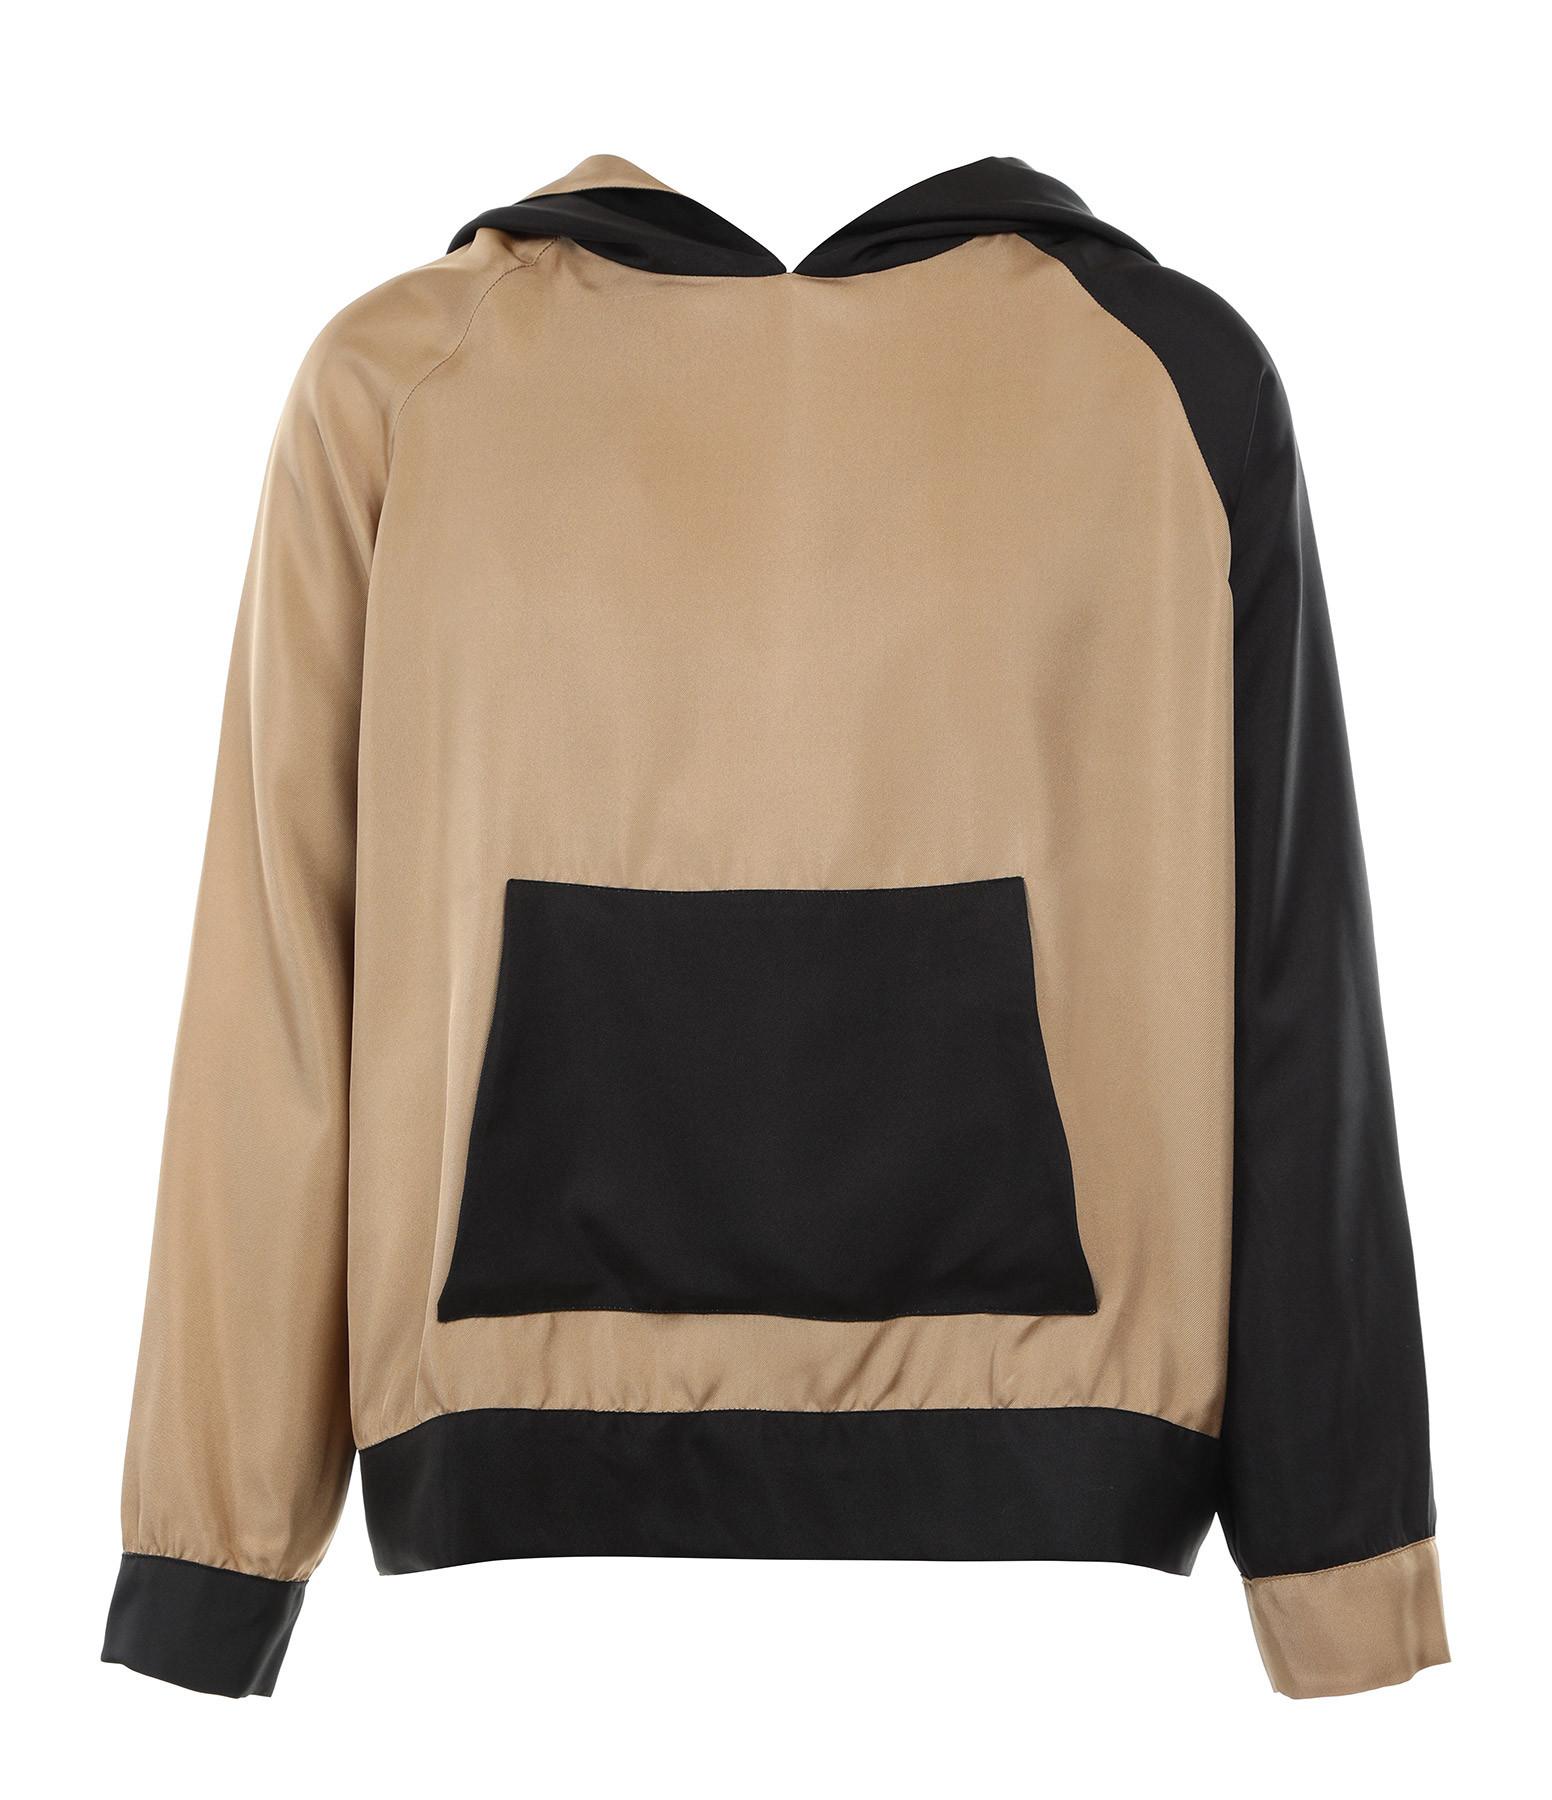 LA PRESTIC OUISTON - Sweatshirt Hoodie Soie Naturel